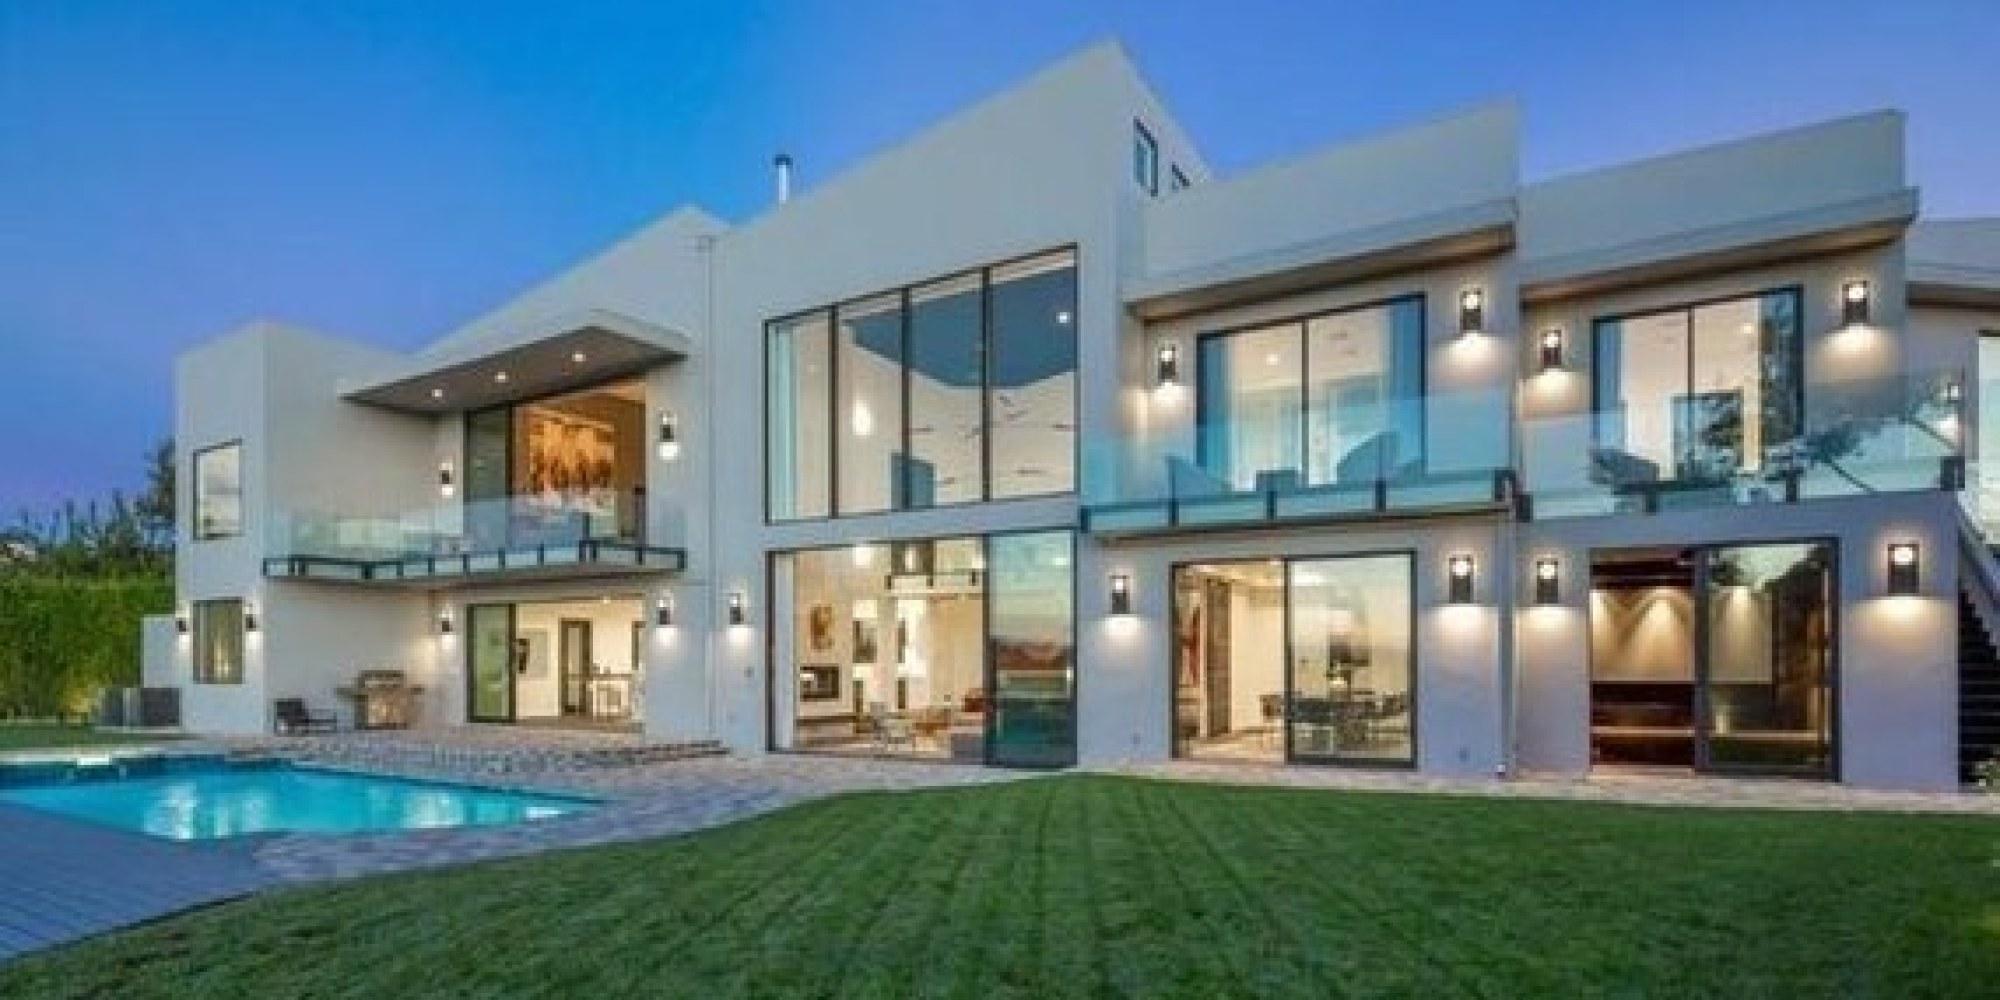 John Legend and Chrissy Teigen Buy Rihanna's Former Home ...